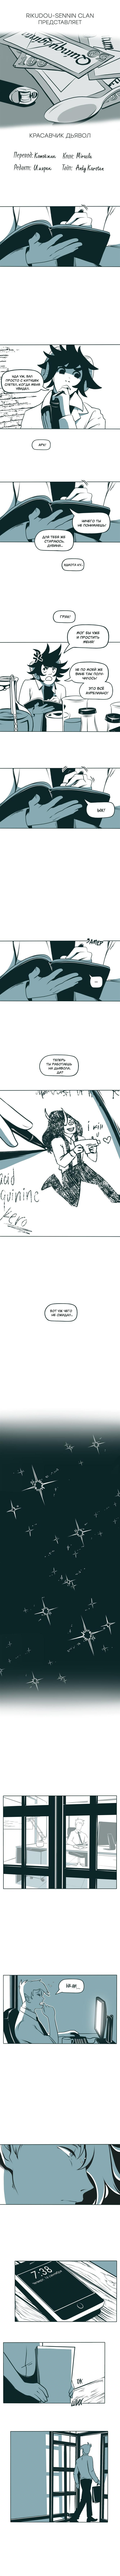 https://r1.ninemanga.com/comics/pic2/0/33536/420927/1534437807842.jpg Page 3